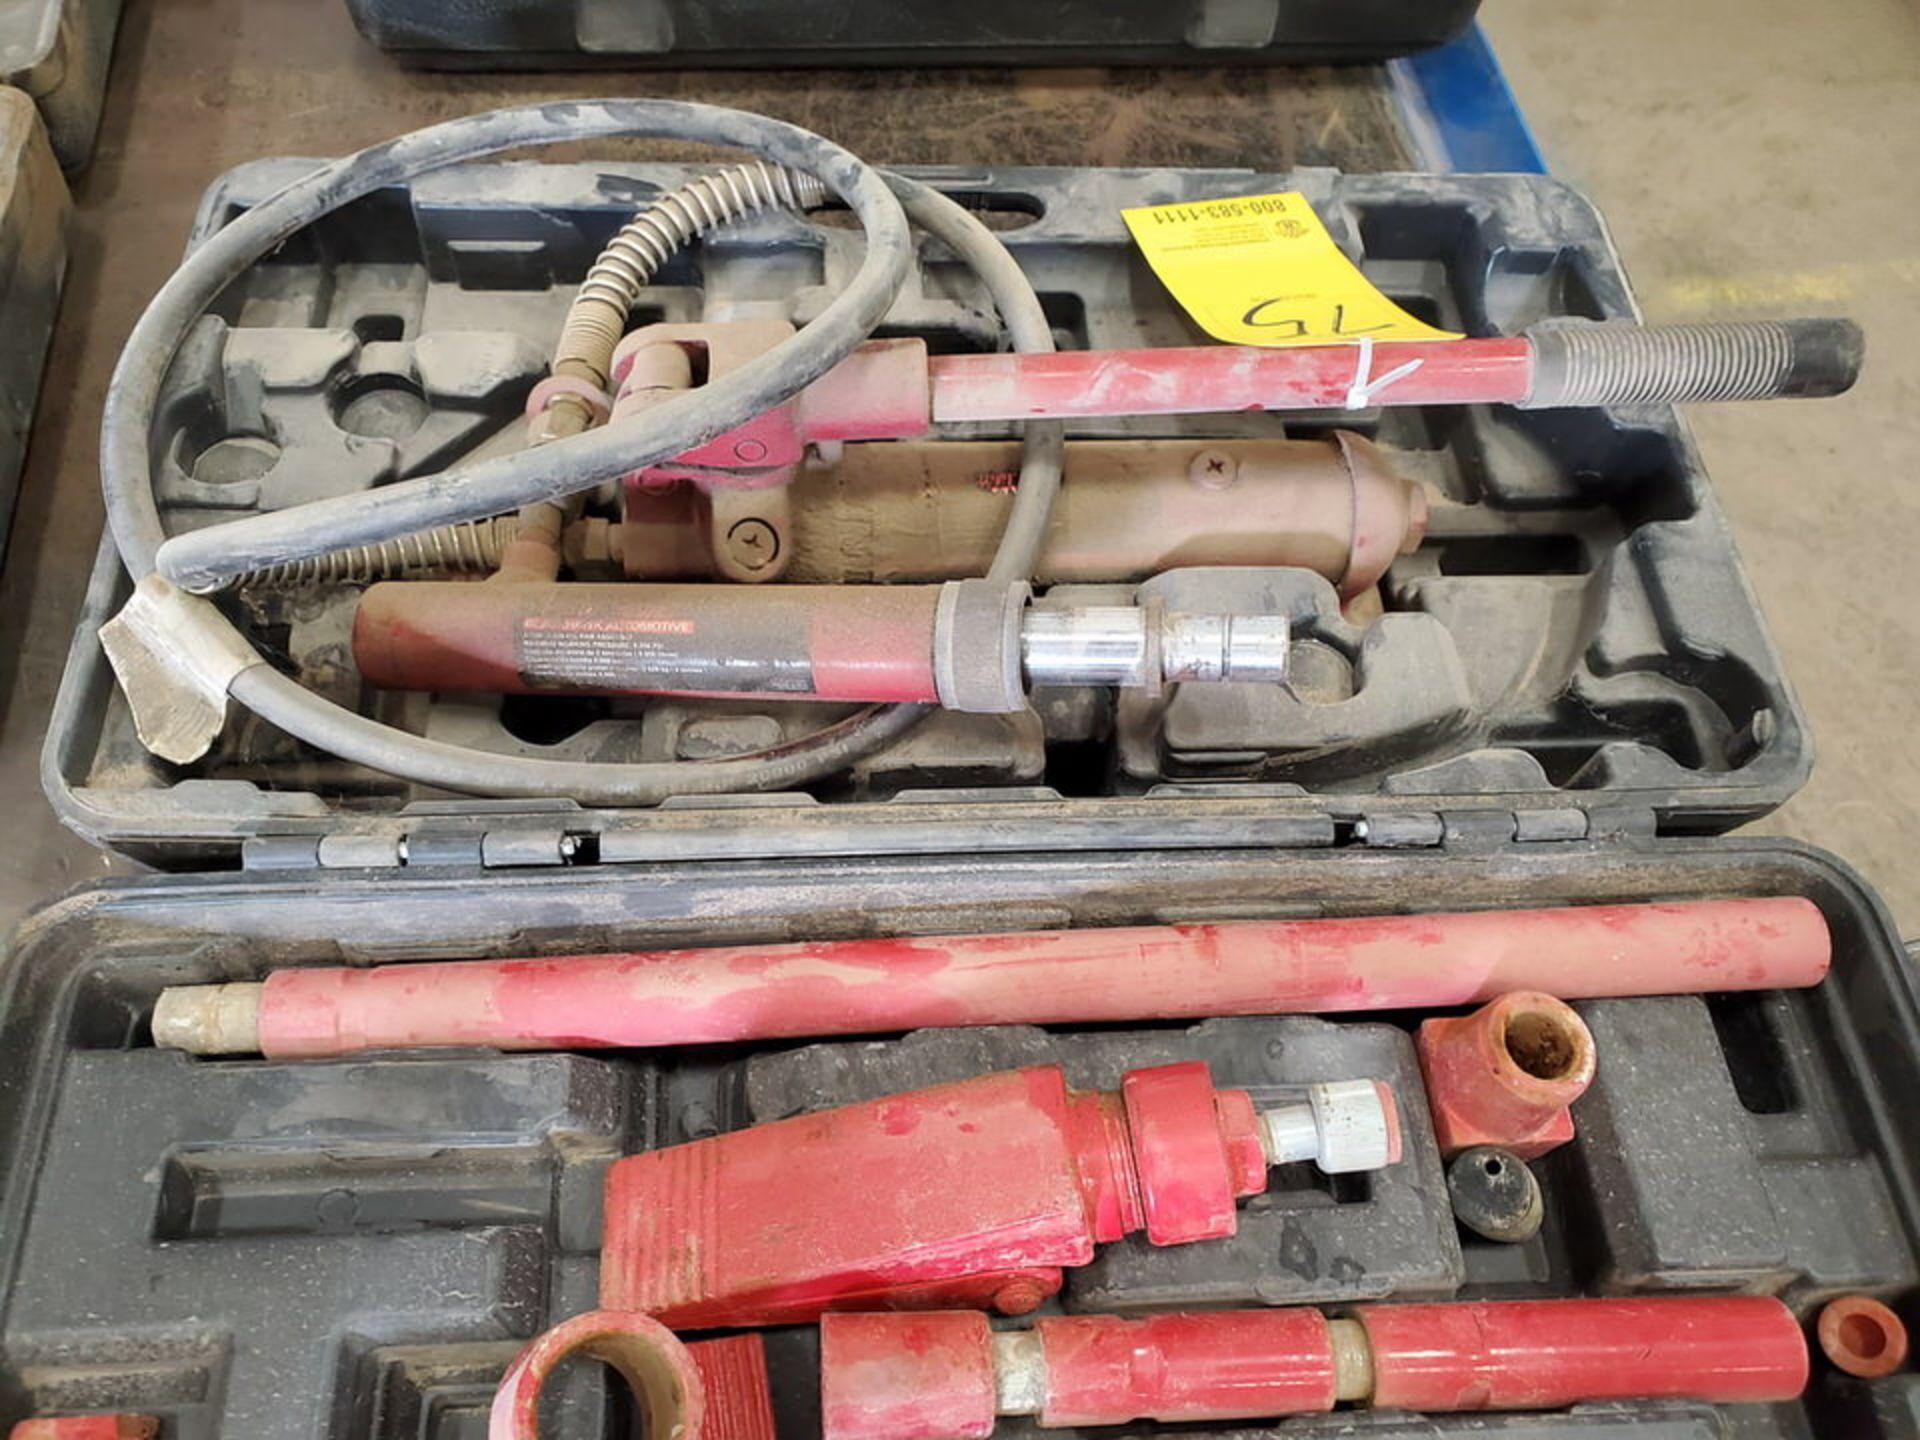 Proto 4 Ton Hydraulic Body Repair Kit - Image 4 of 5